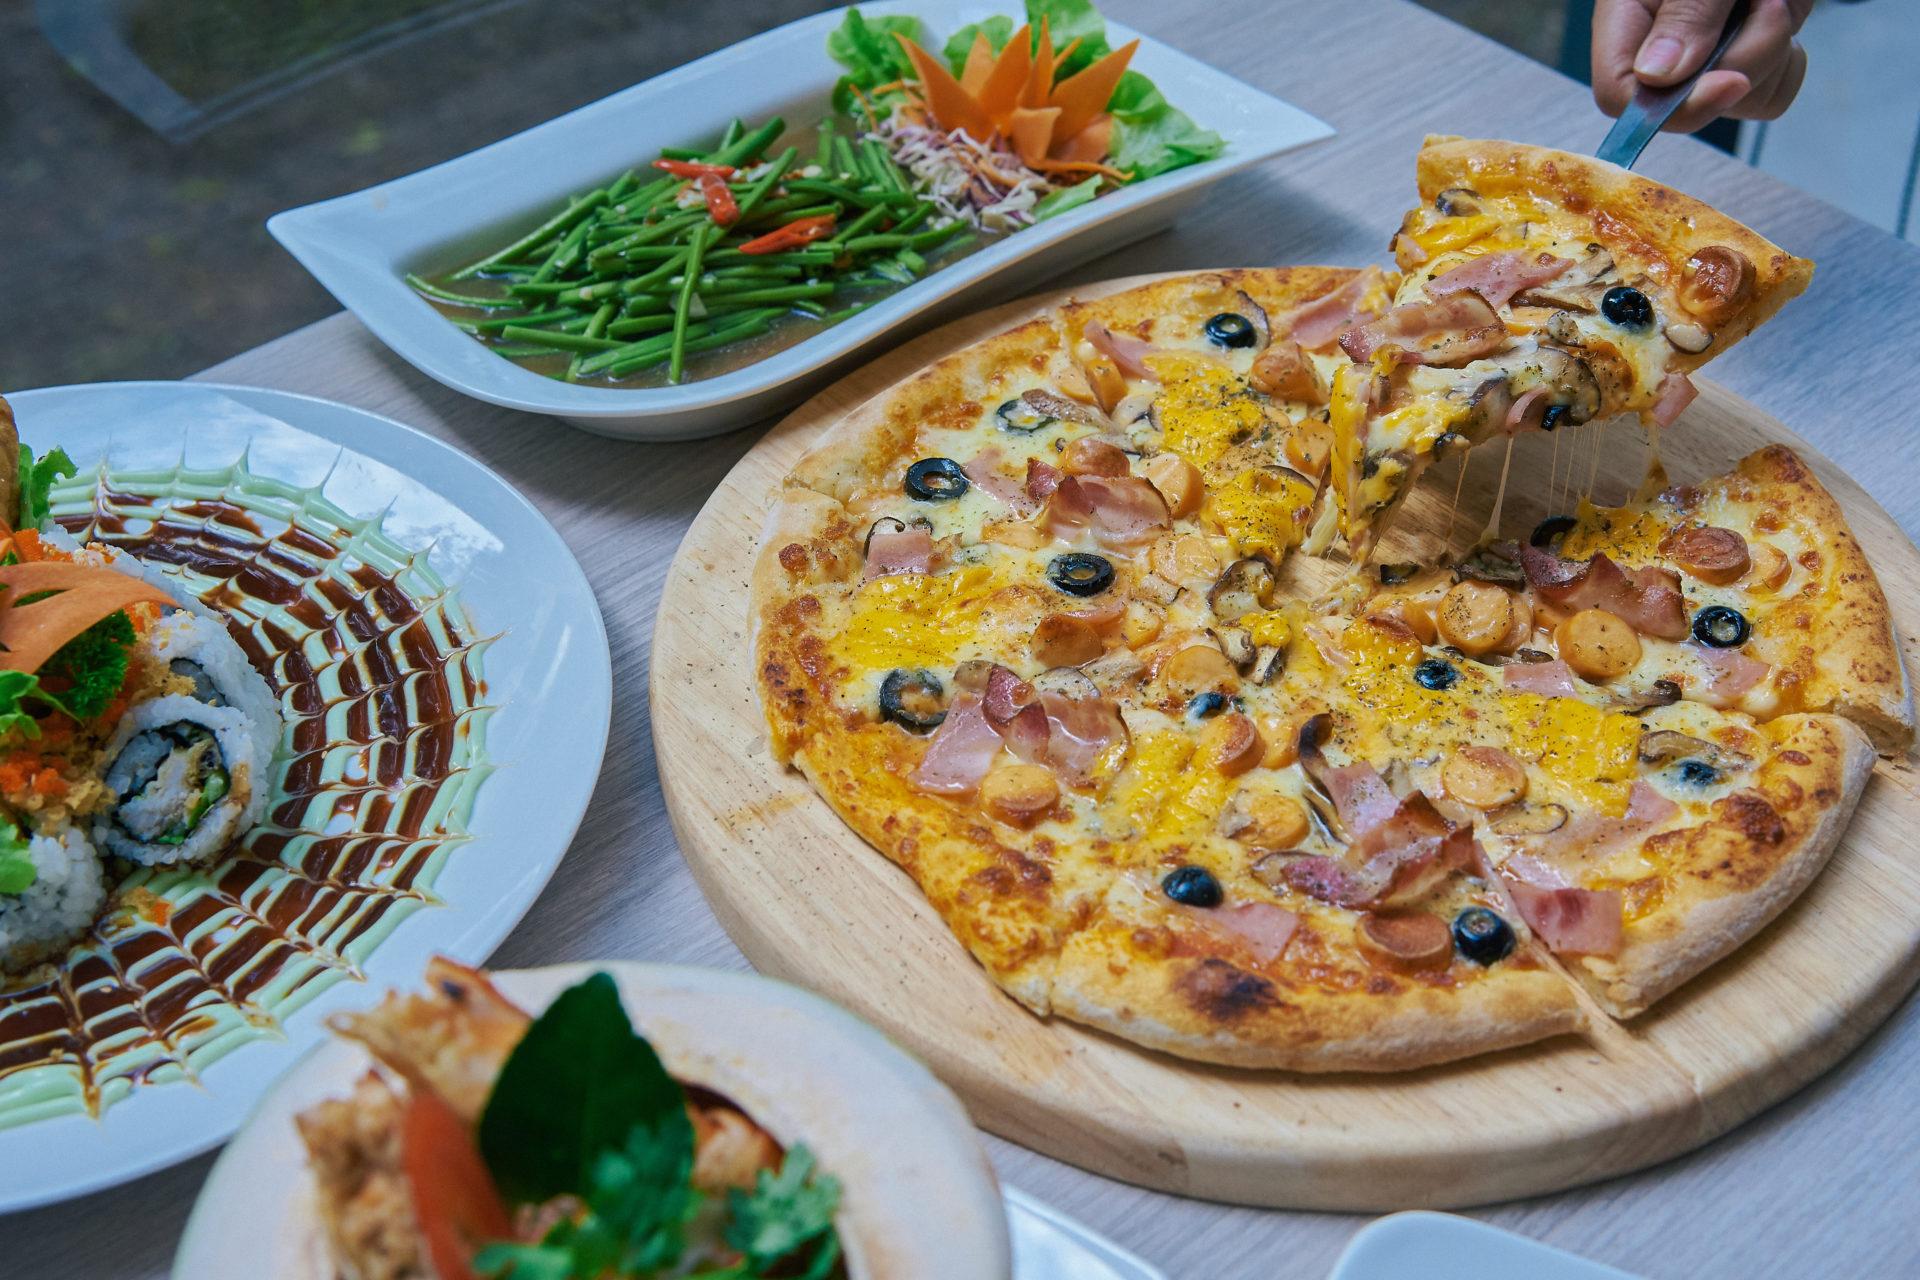 Serenity pizza